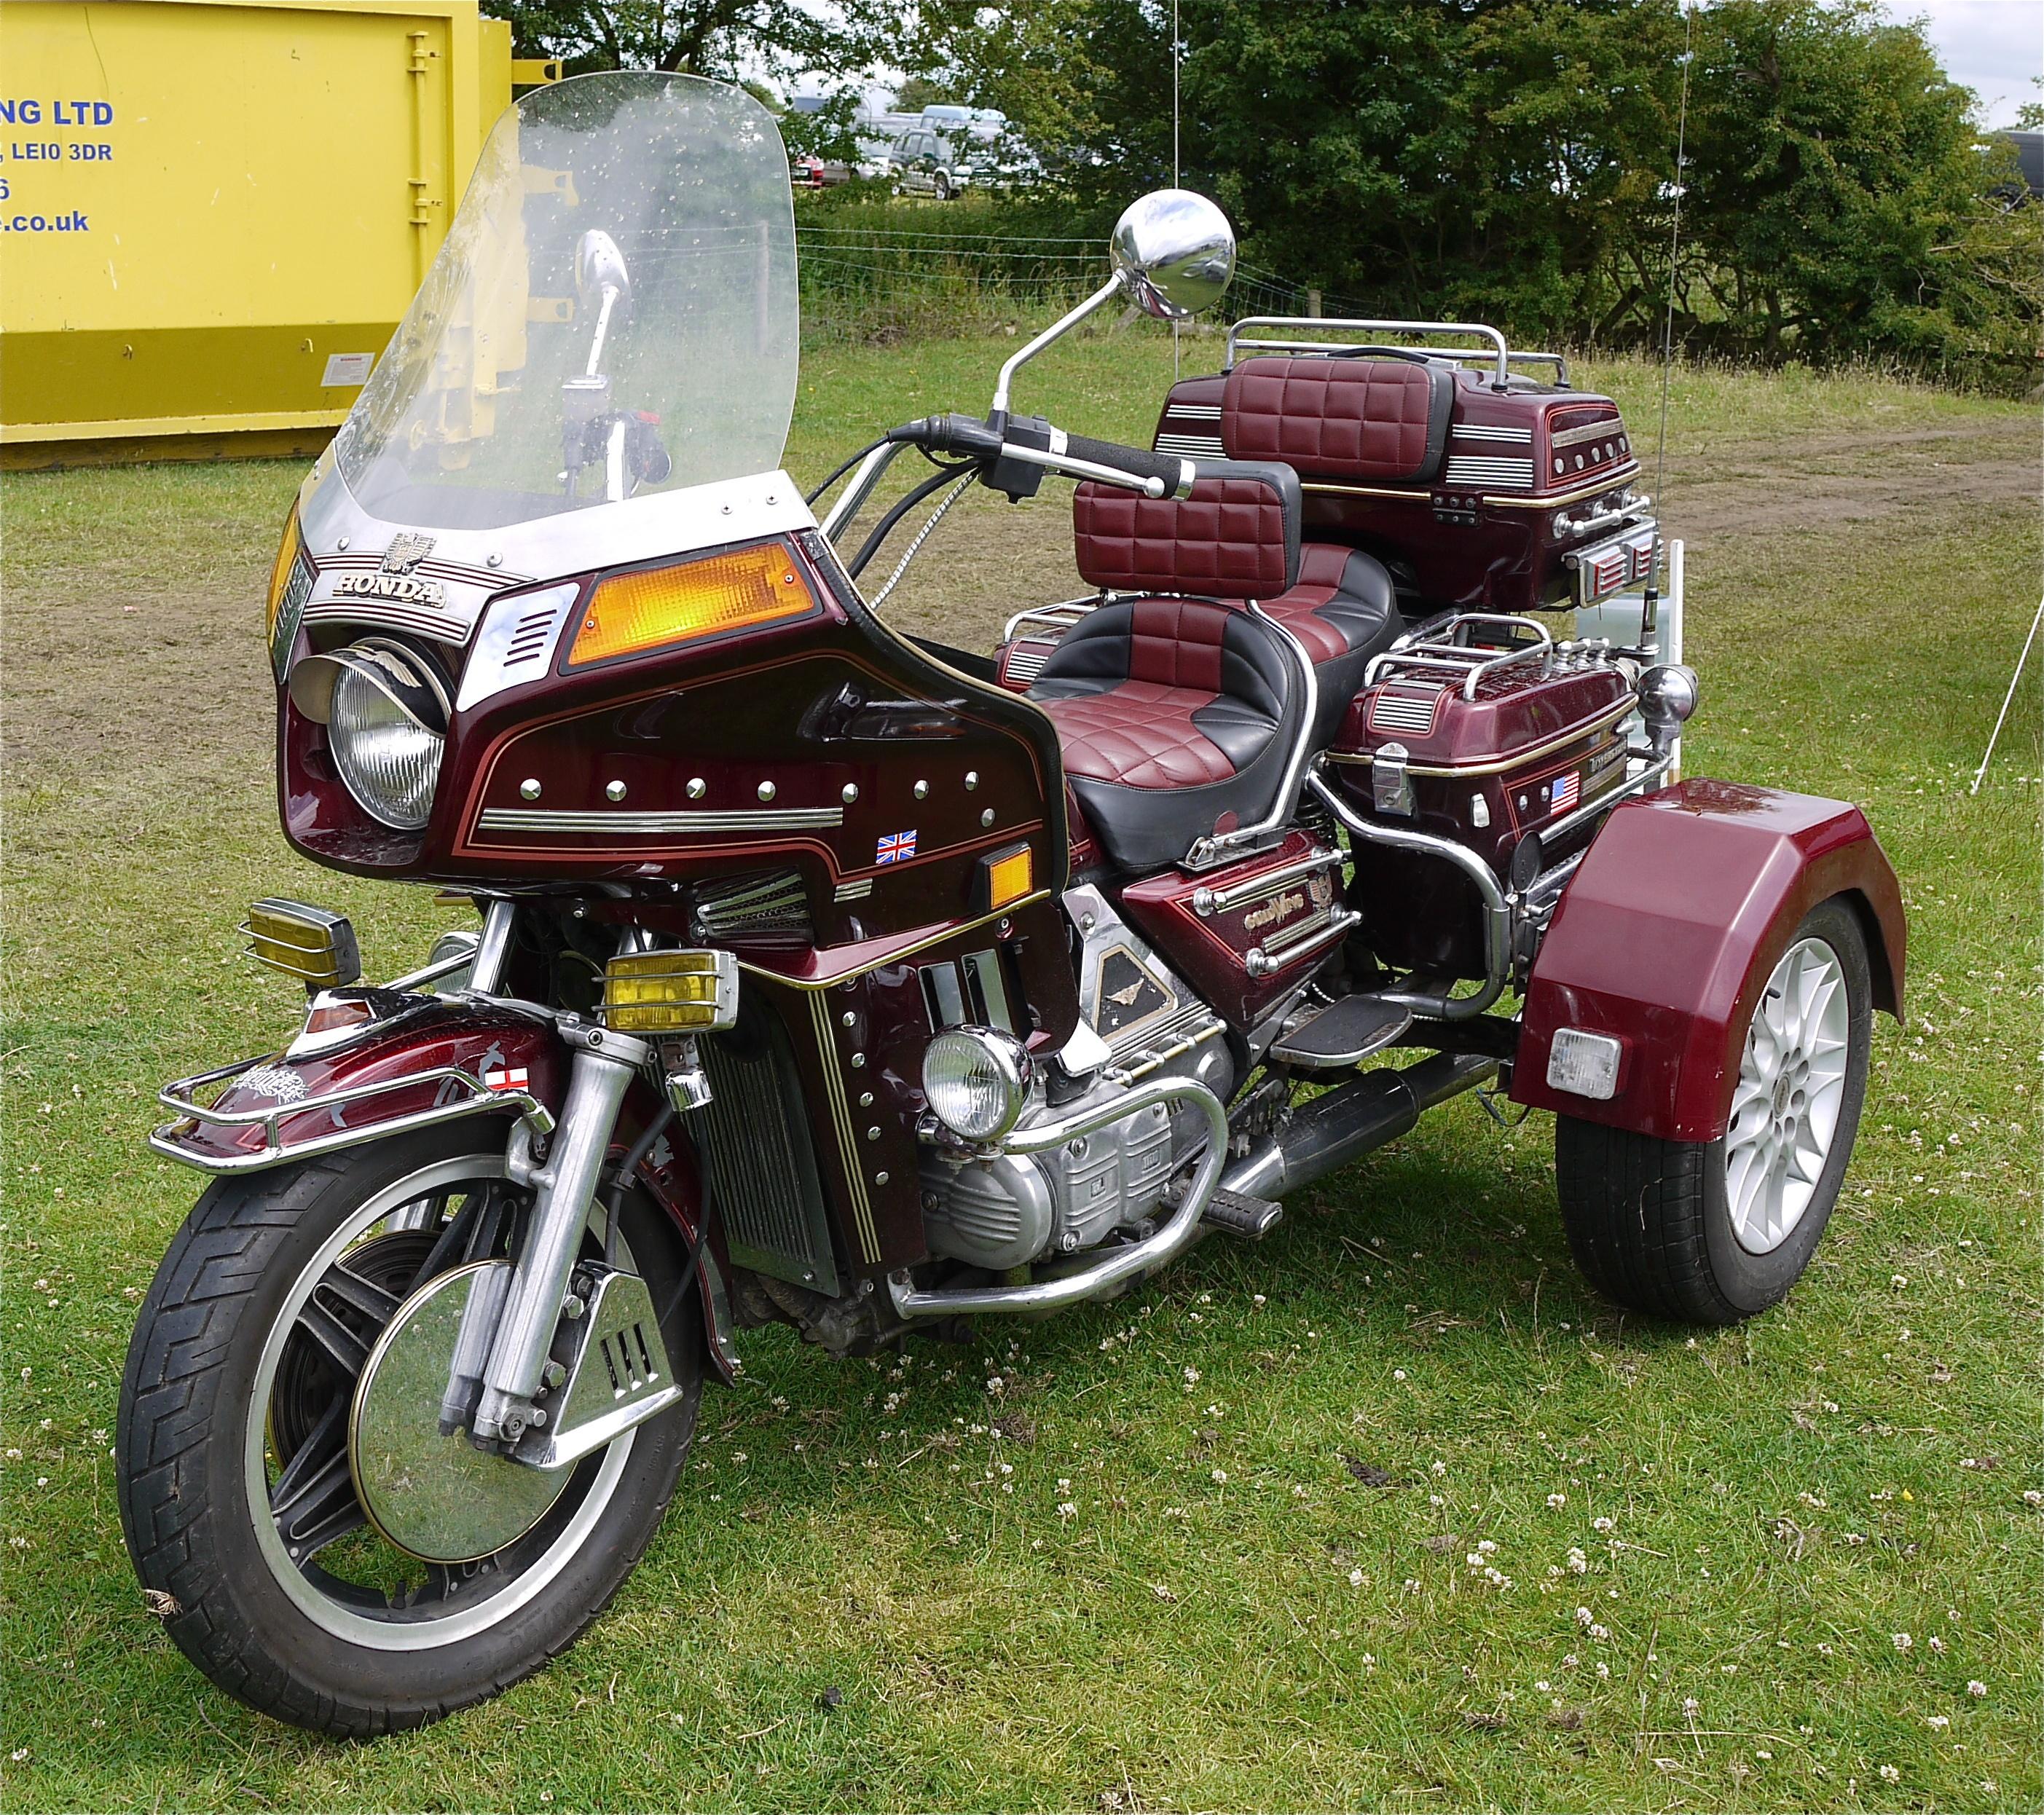 File:Honda Gold Wing Trike - Flickr - mick - Lumix.jpg ...